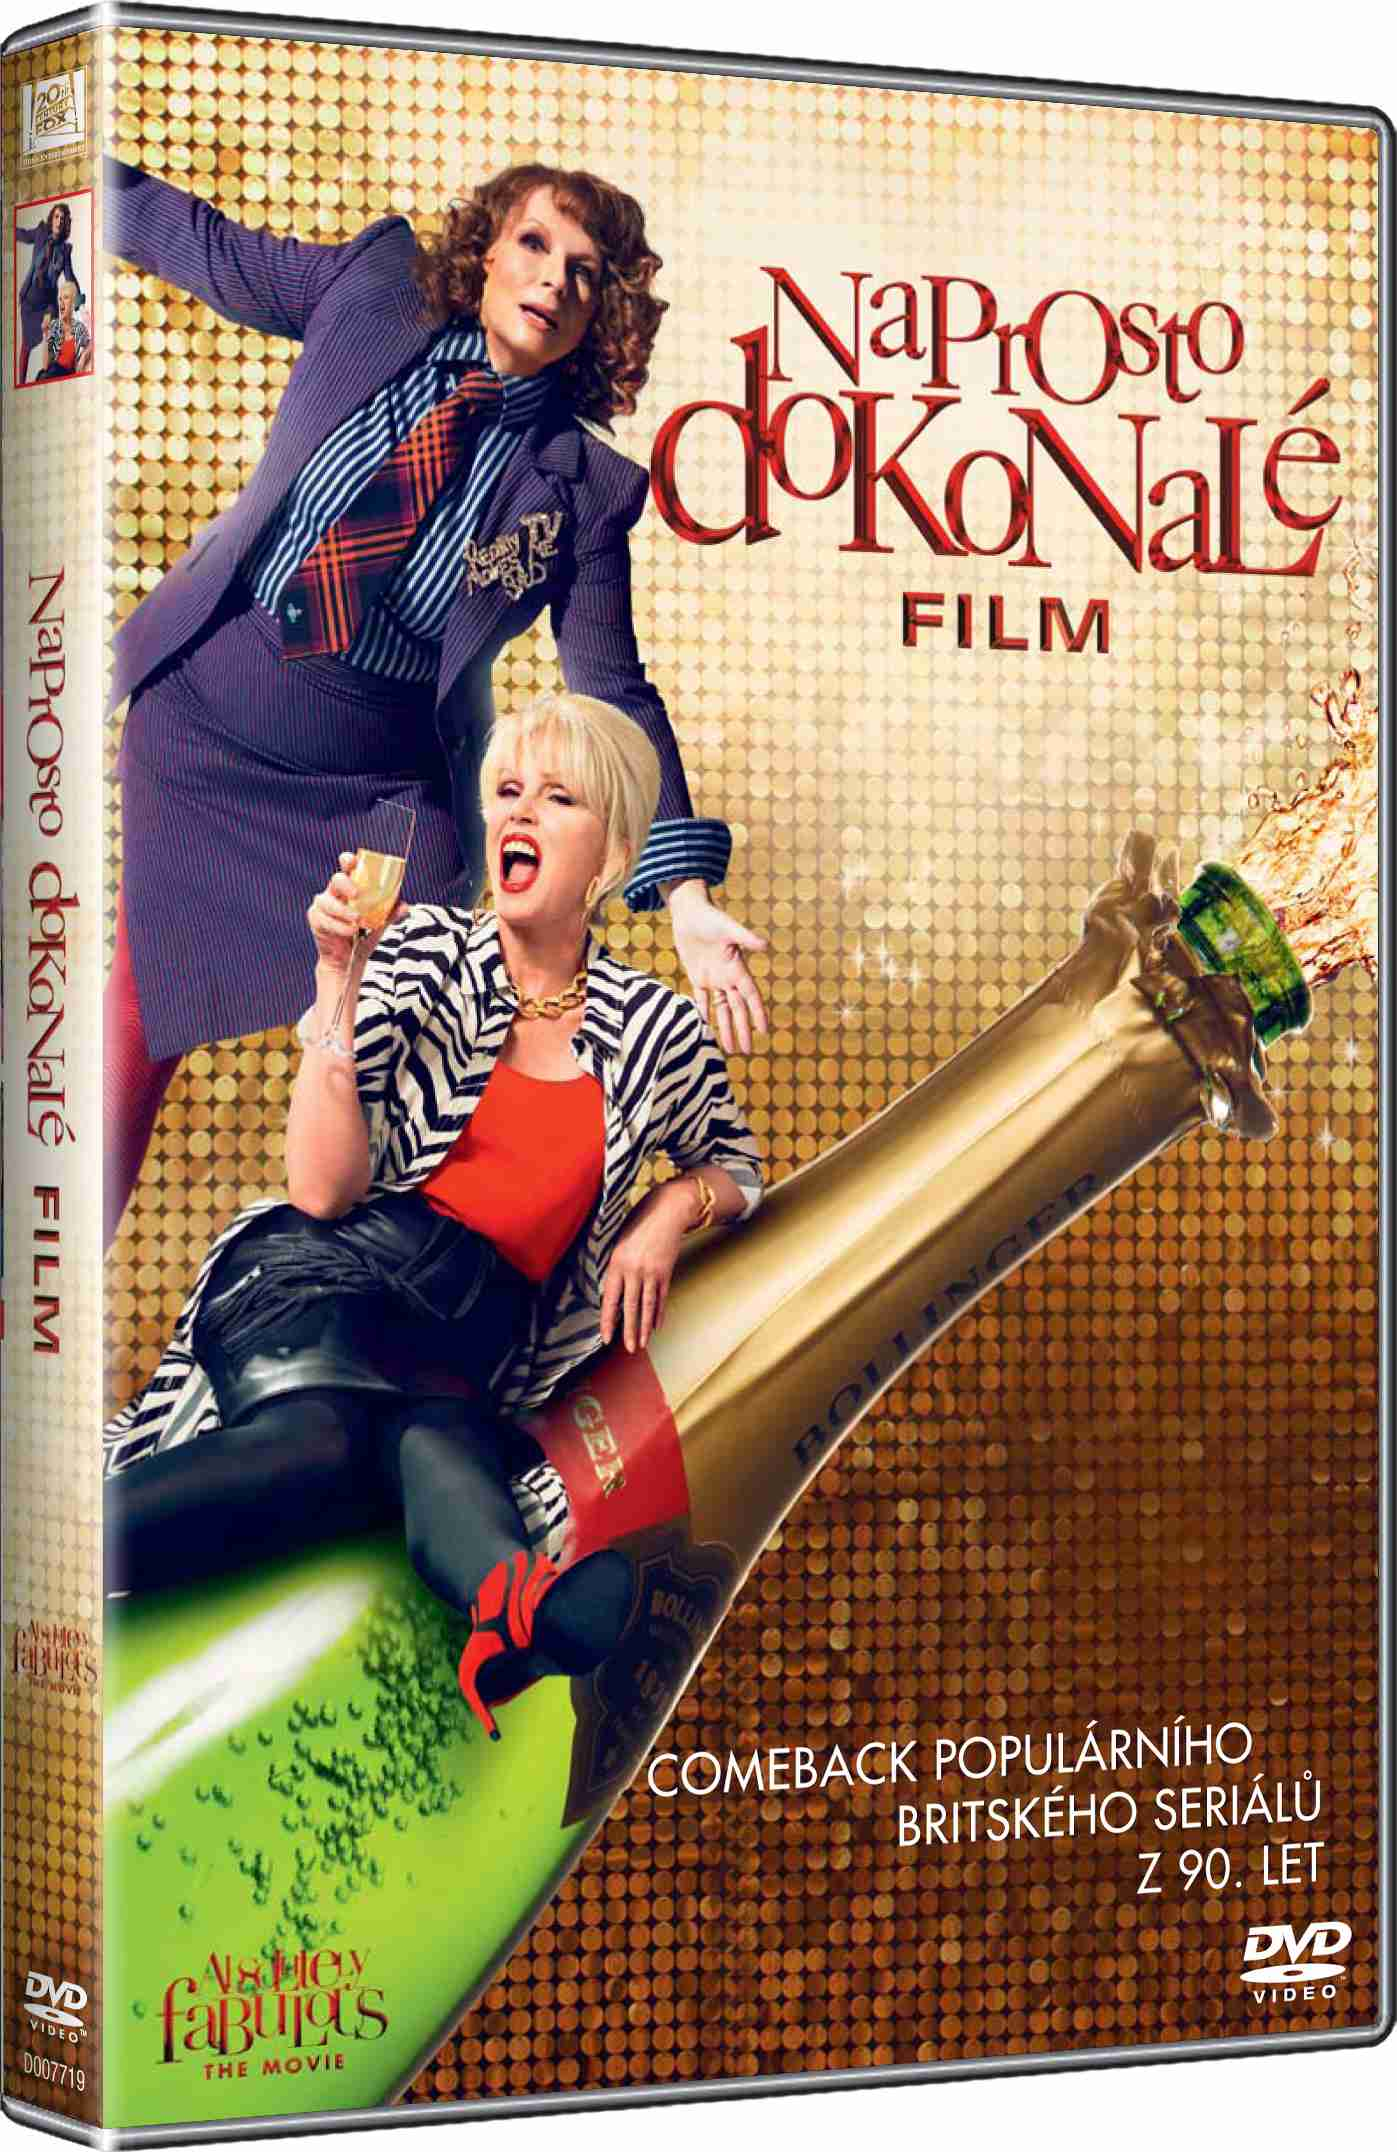 Naprosto dokonalé: film - DVD